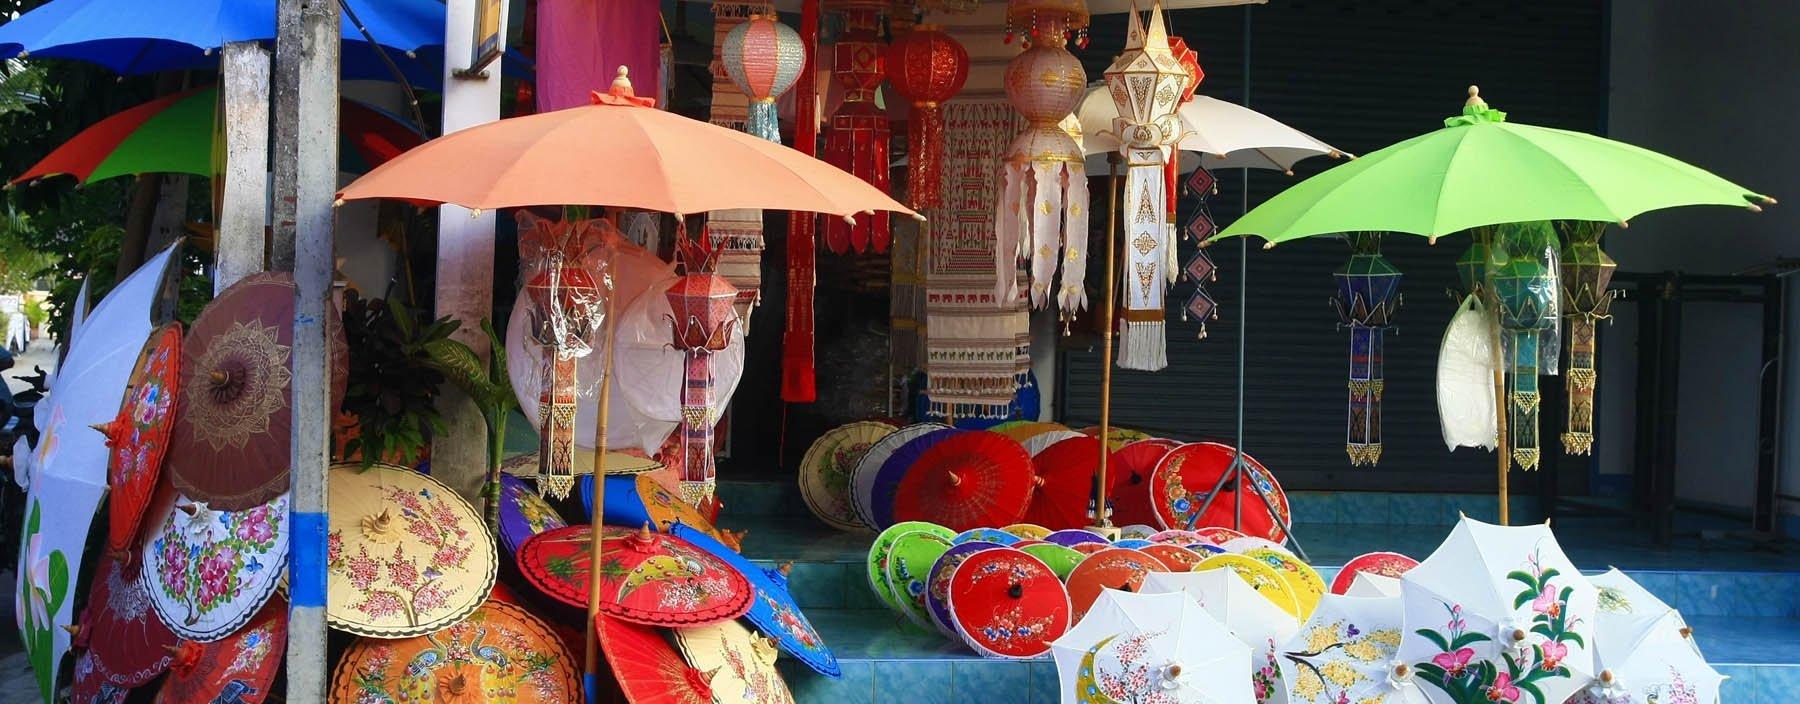 th, chiang mai, saturday night market (1).jpg